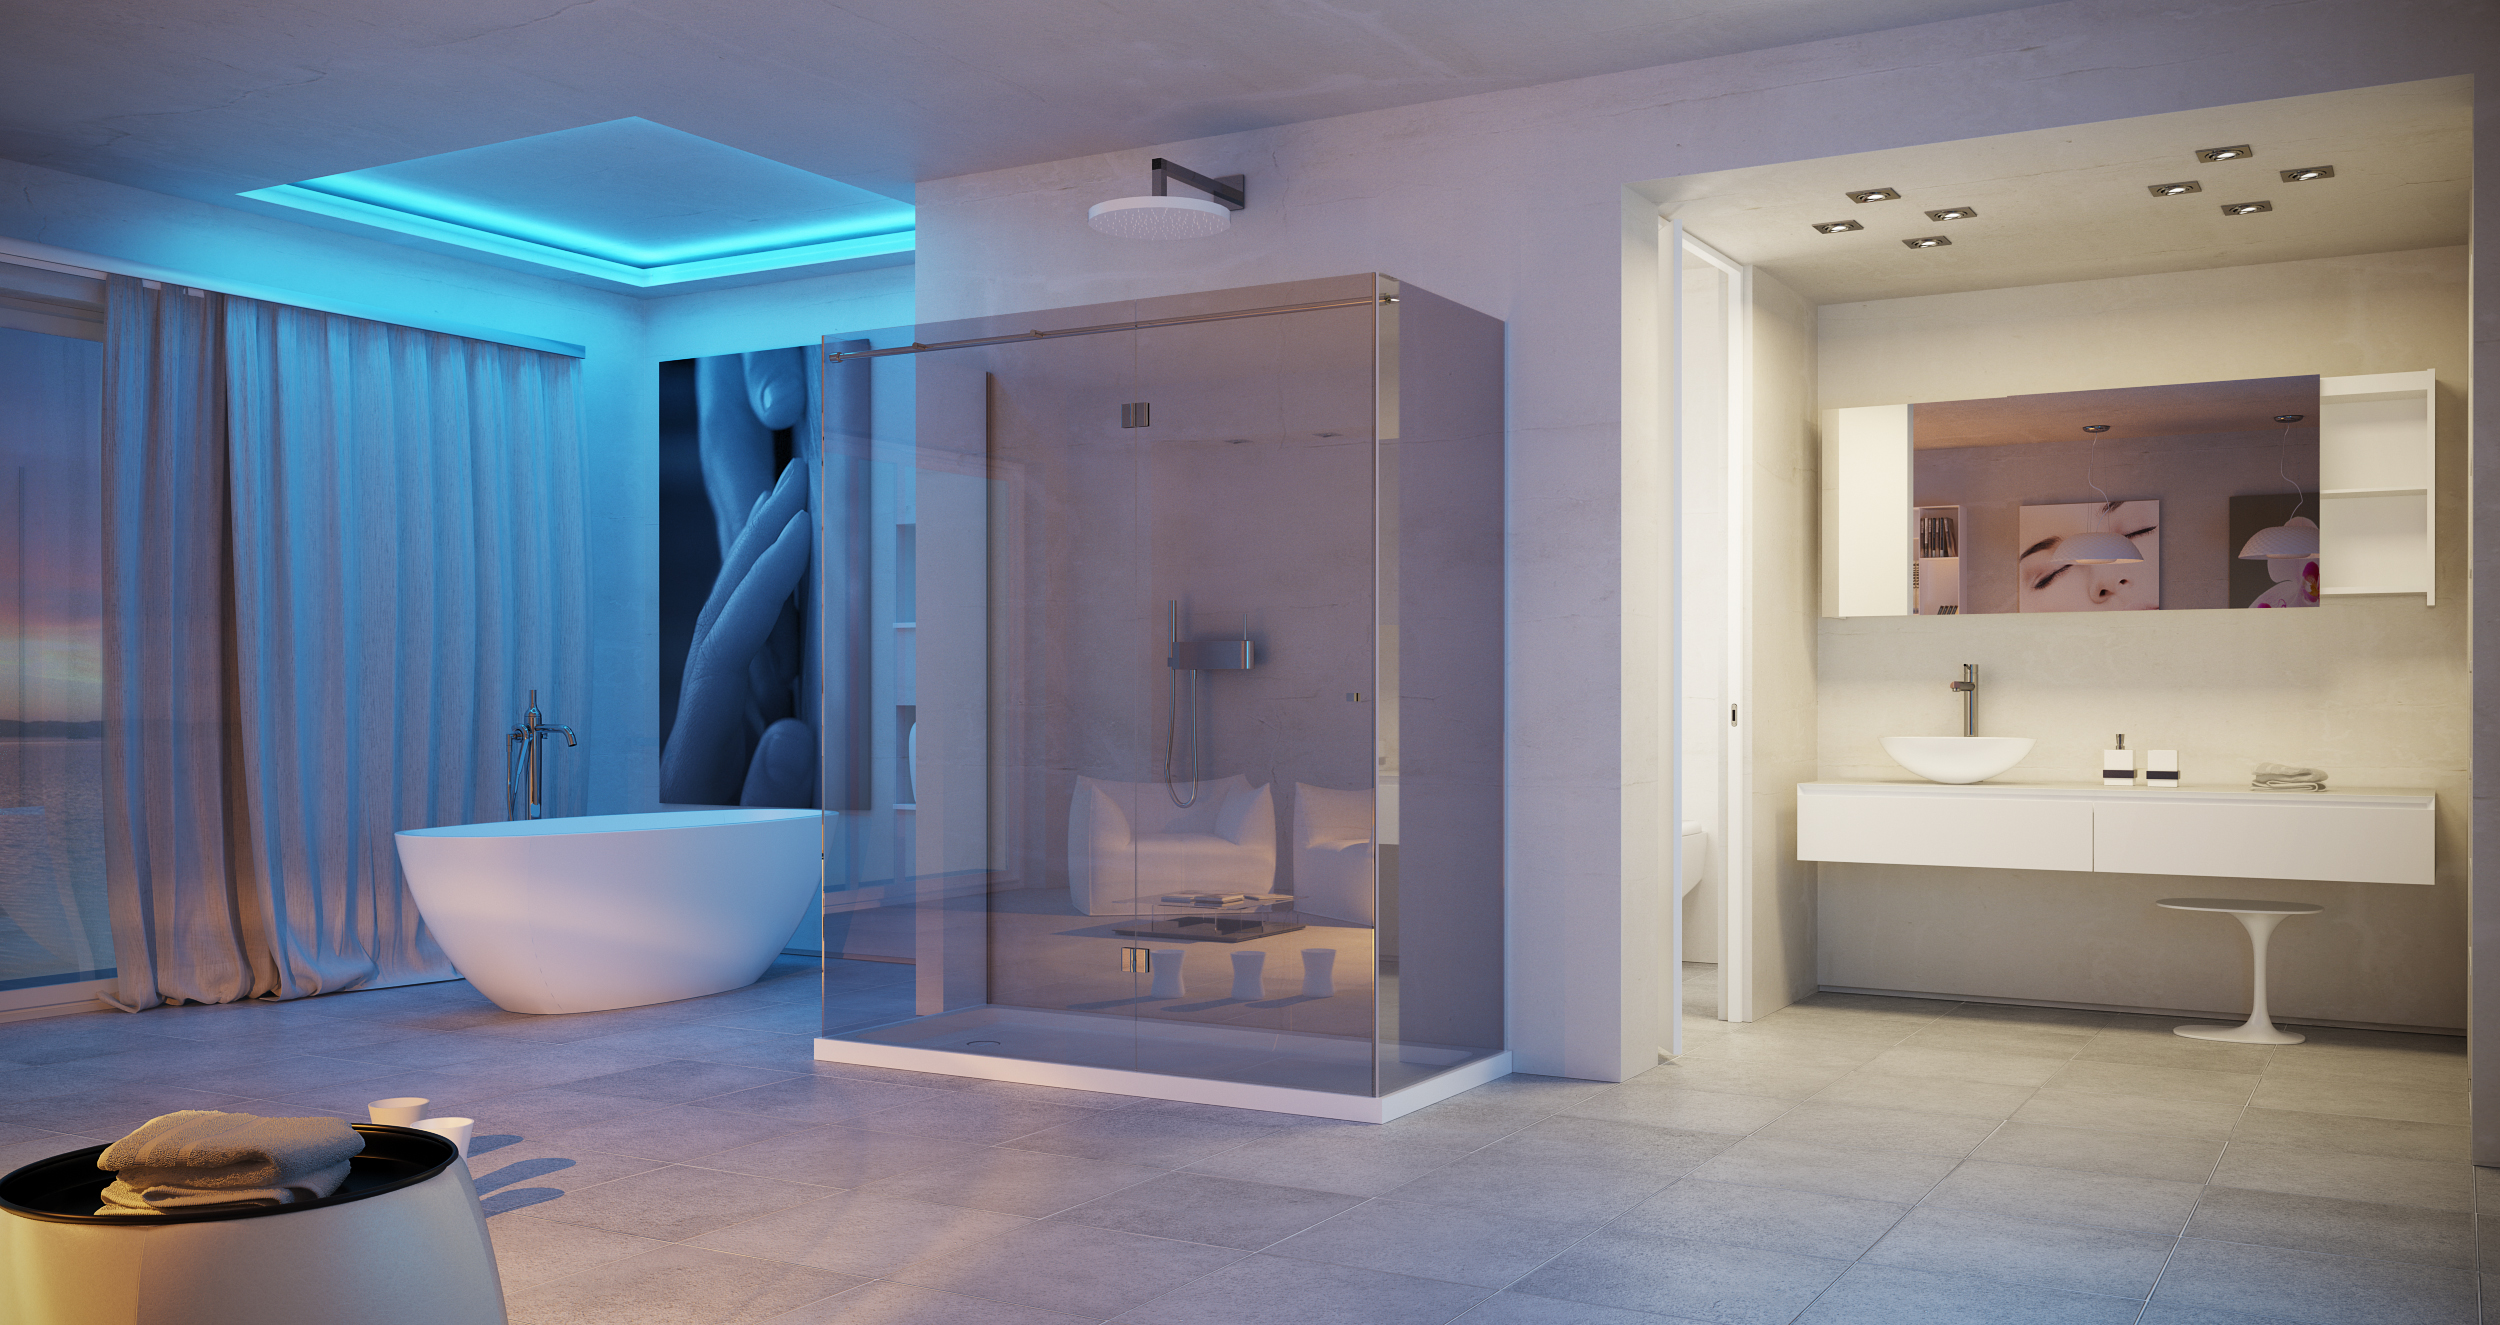 Ovale badewanne turquoise tub by dimasi bathroom by archiplast for Badewannen hersteller liste